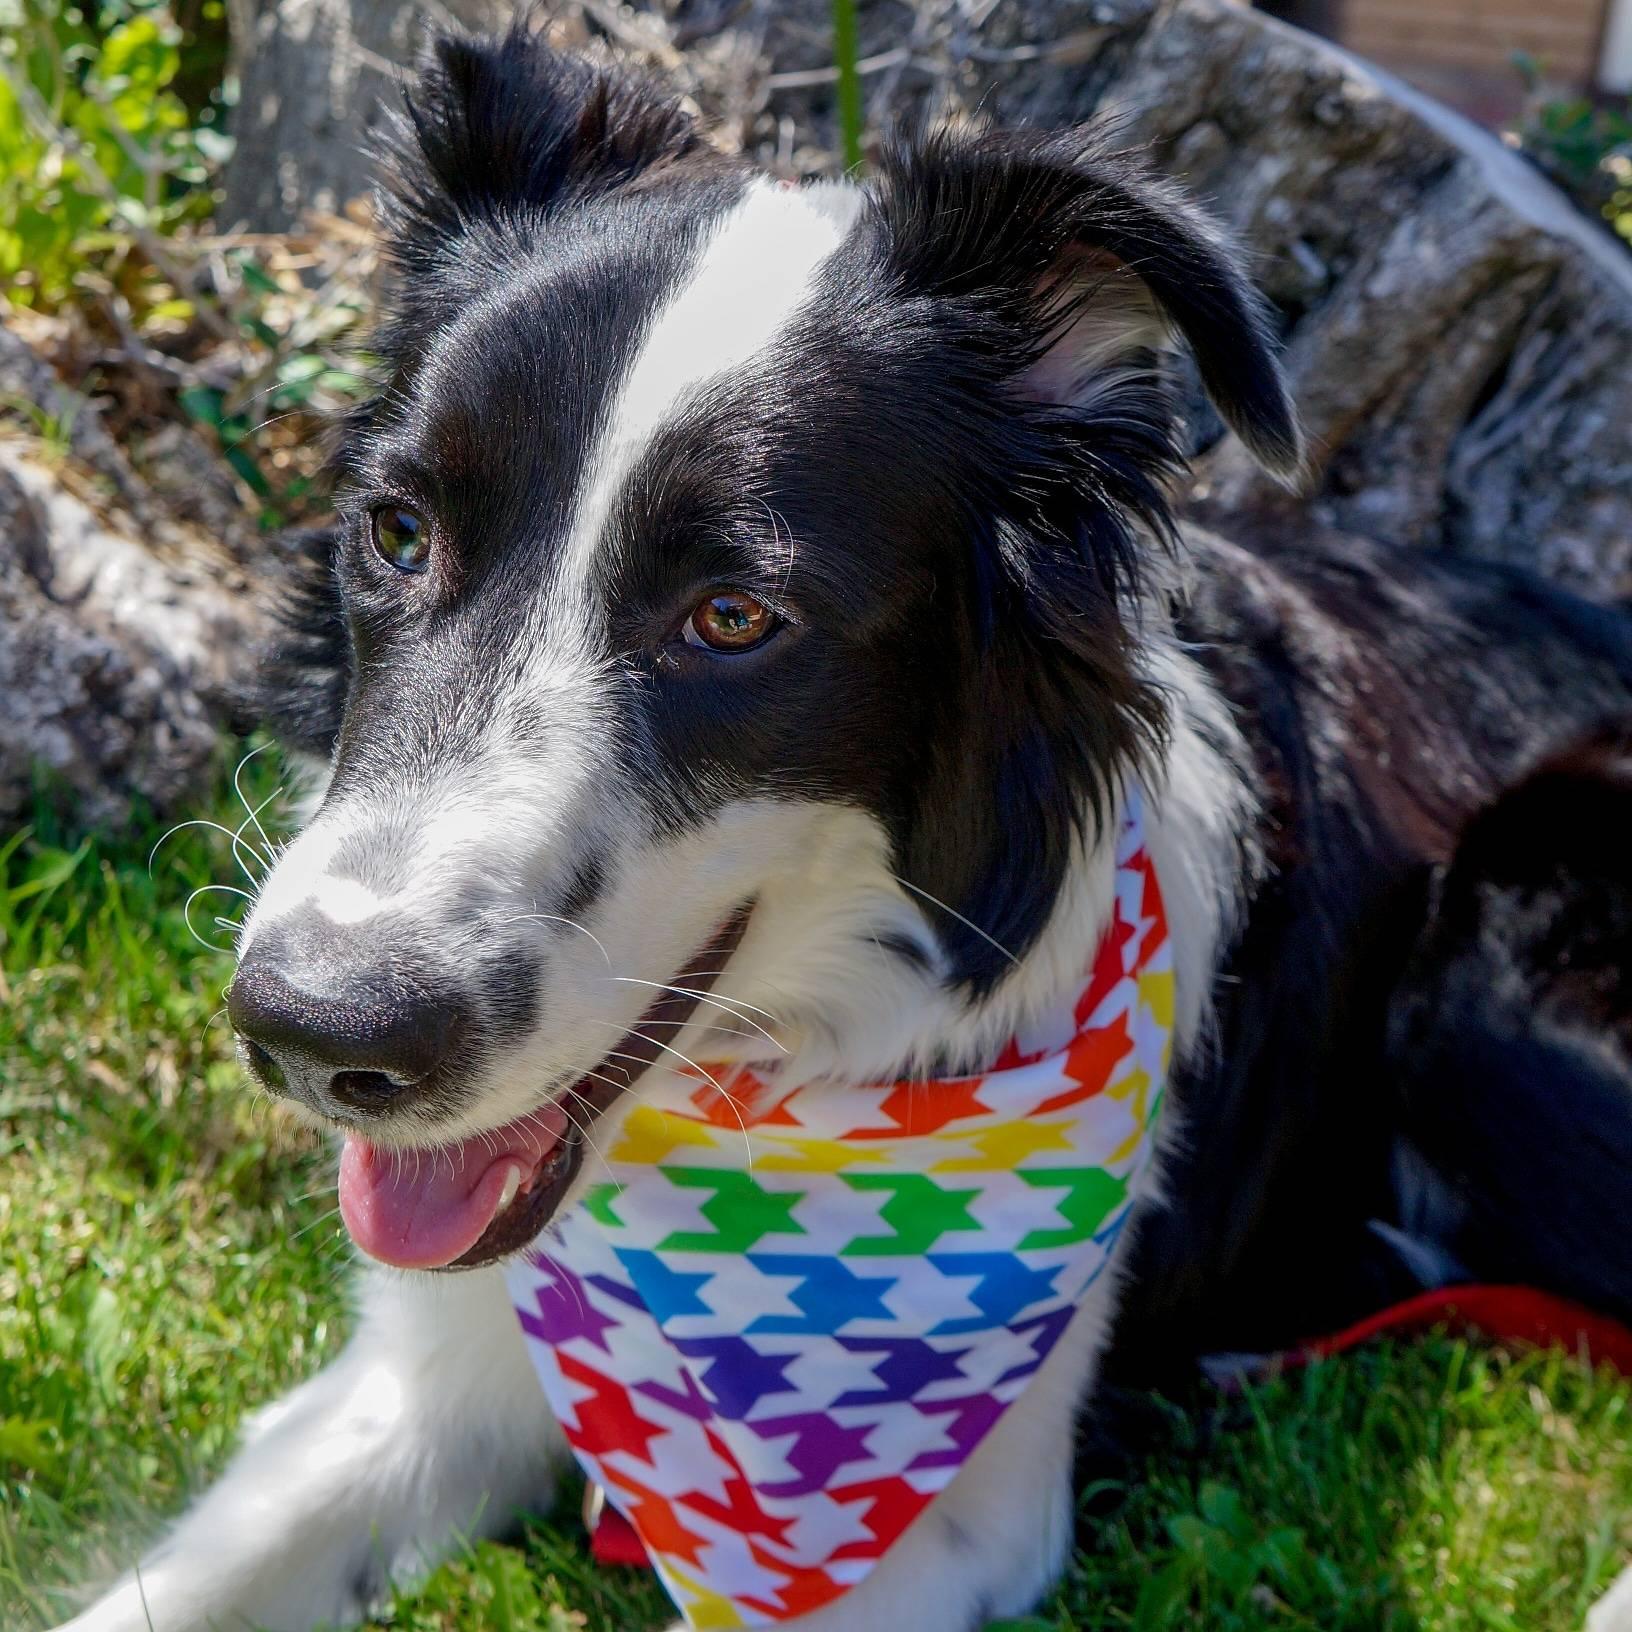 Banana Bunch dog model Hamilton Rainbow Houndstooth dog bandana